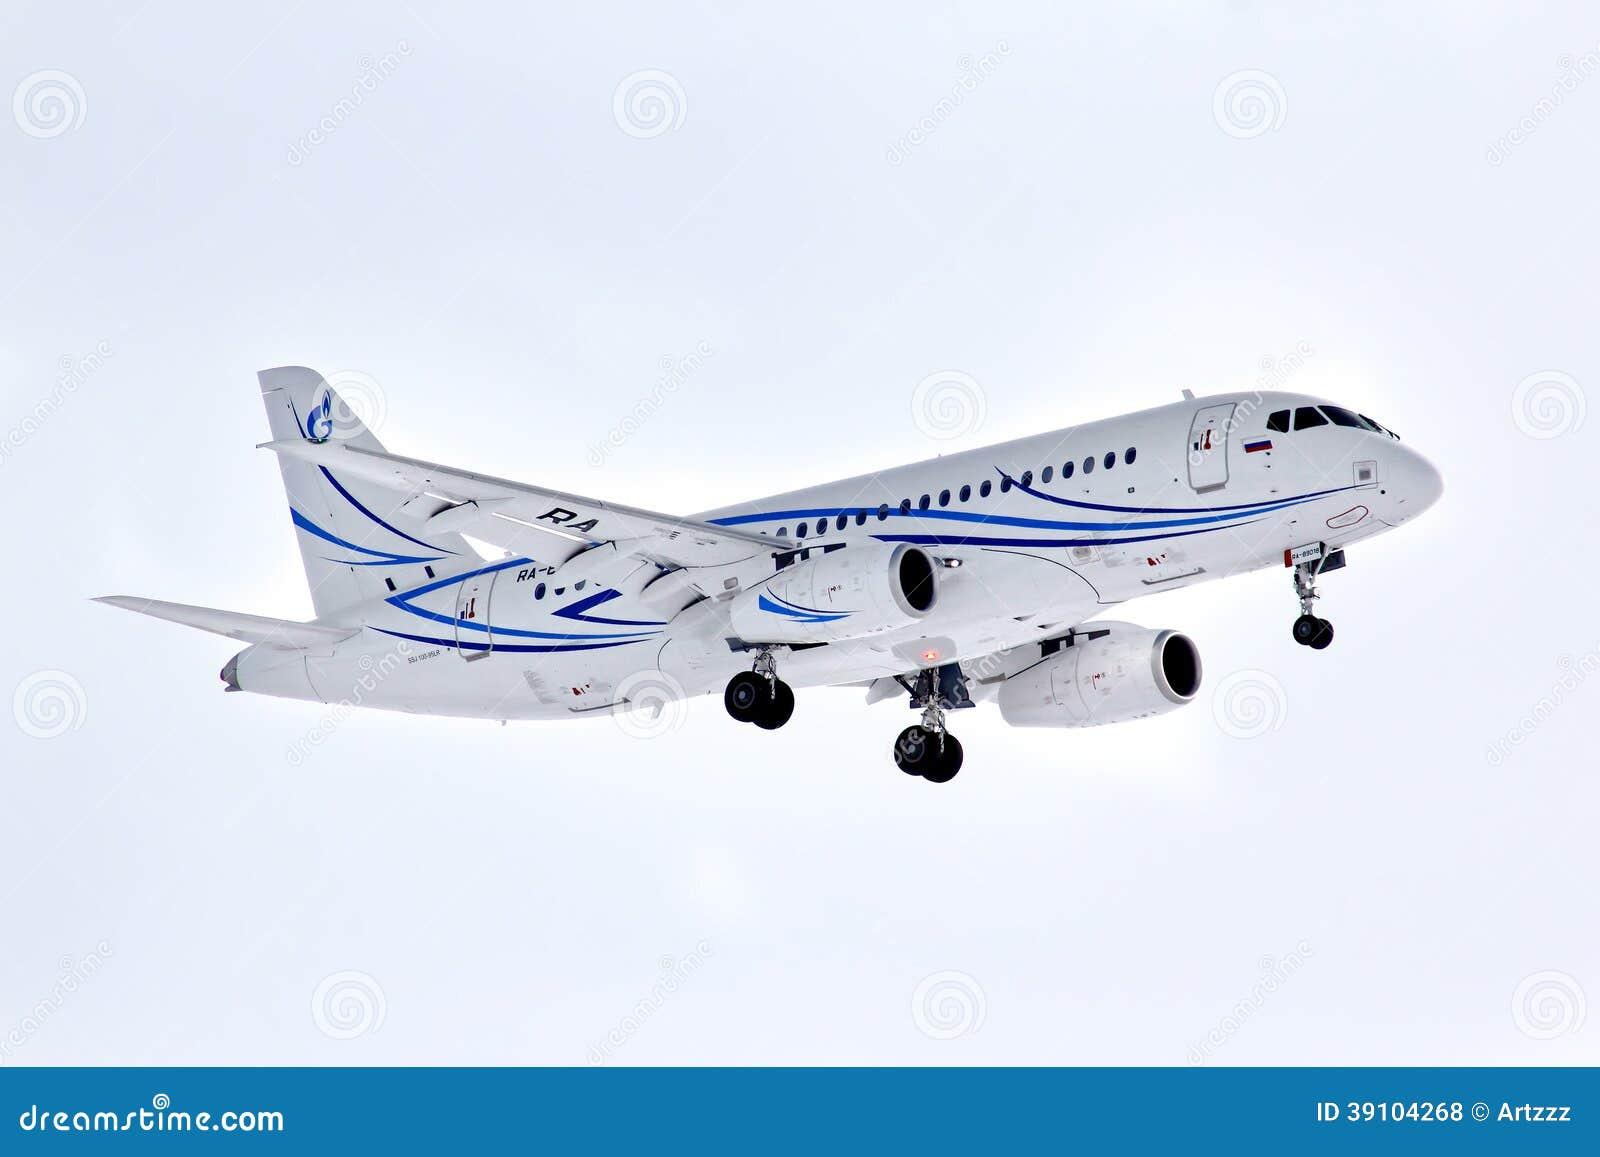 Gazpromavia Sukhoi Superjet 100-95LR